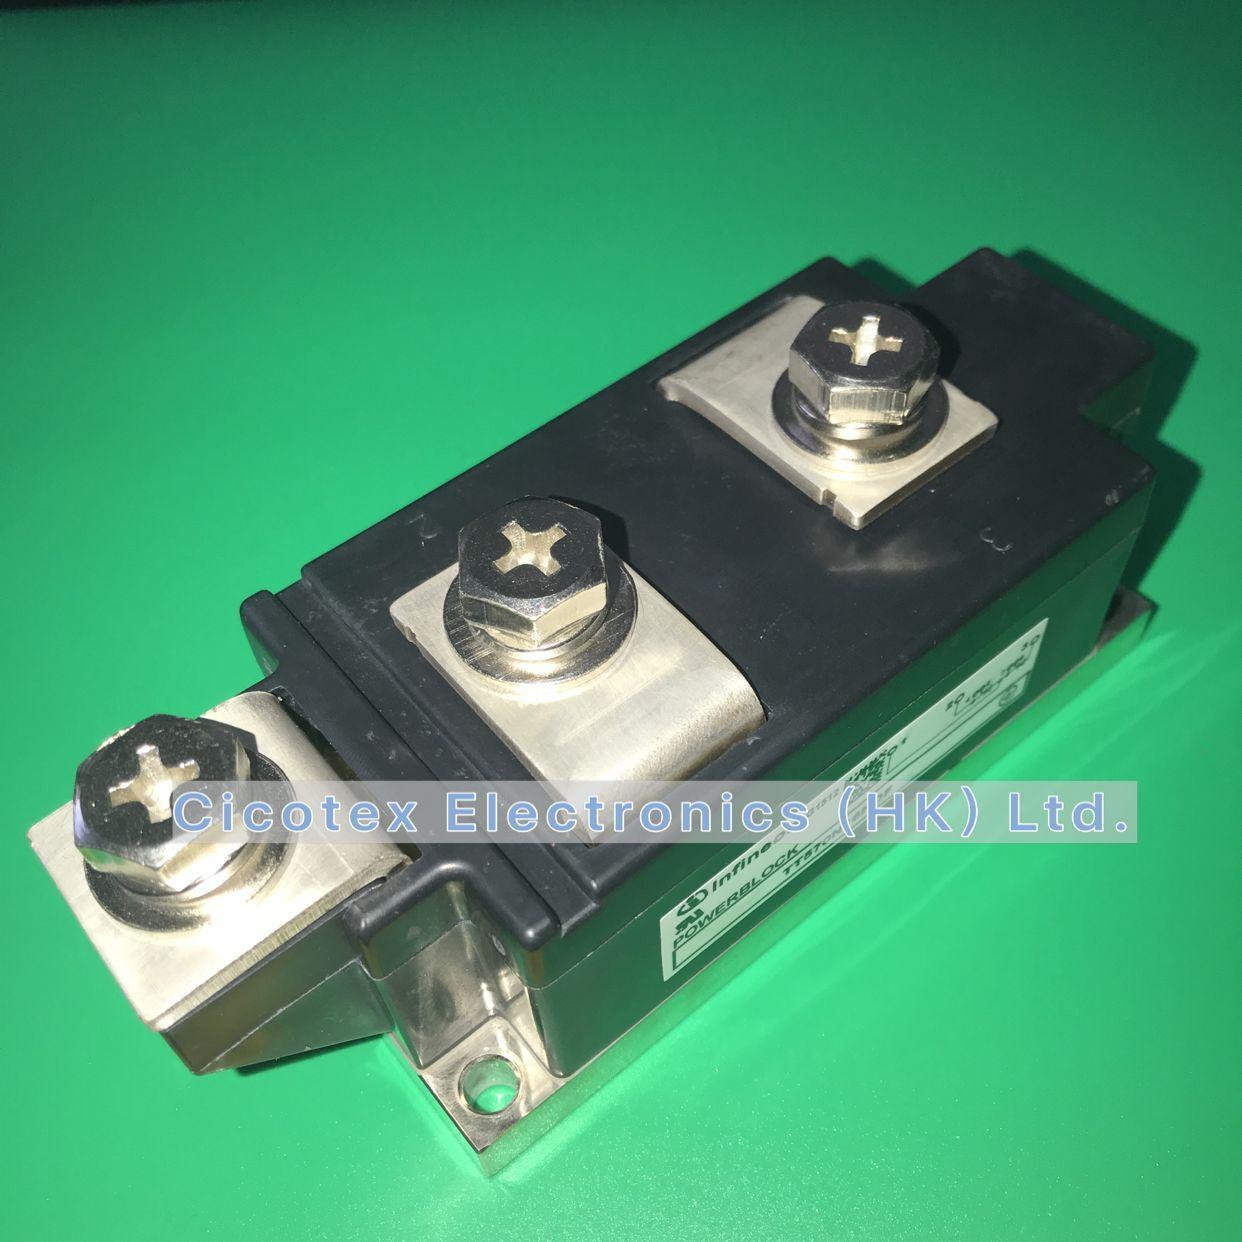 Módulo de Potência IGBT TT570N16KOF